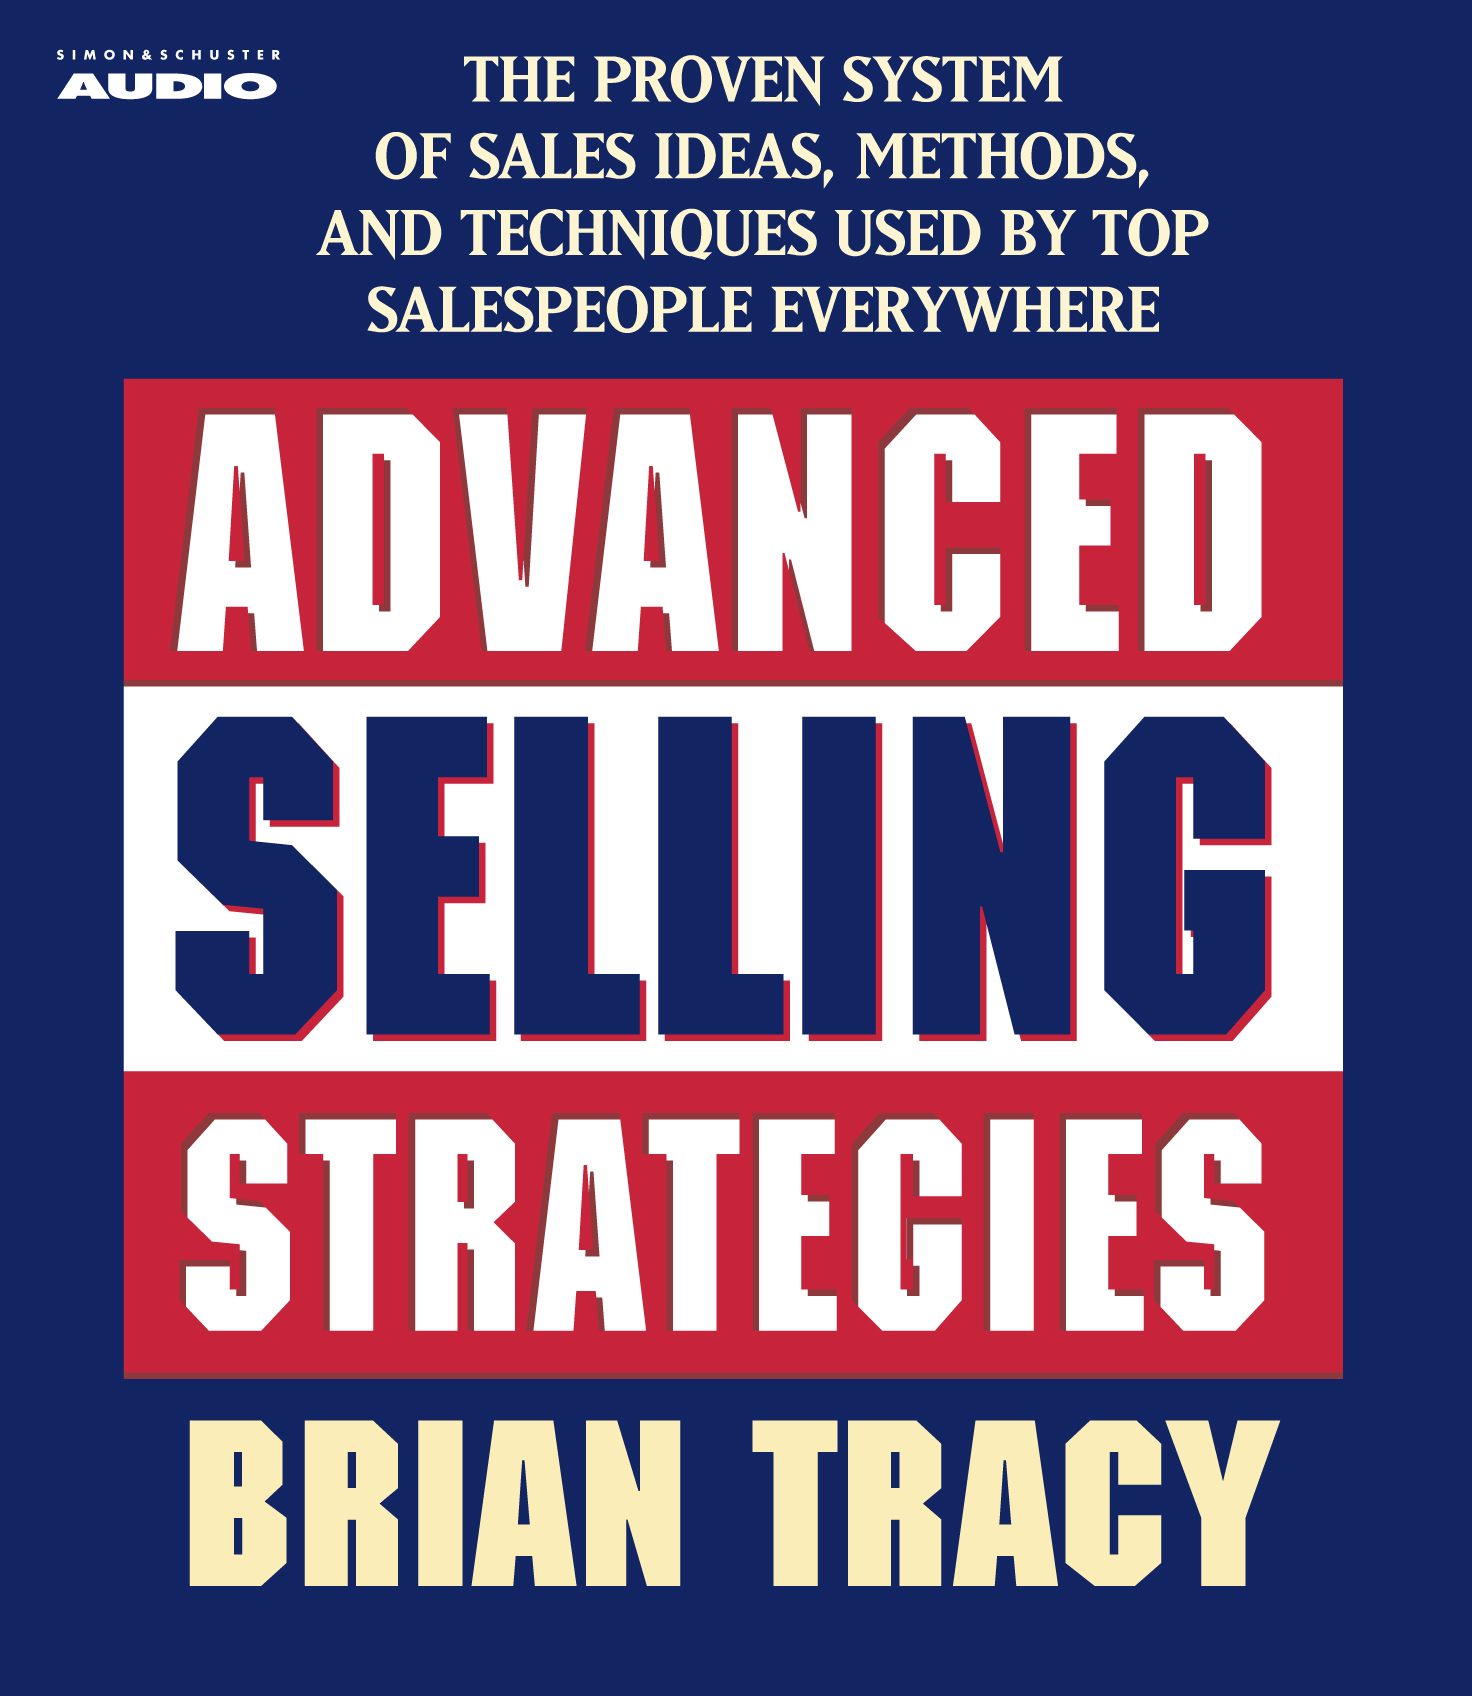 advanced selling strategies brian tracy pdf free download